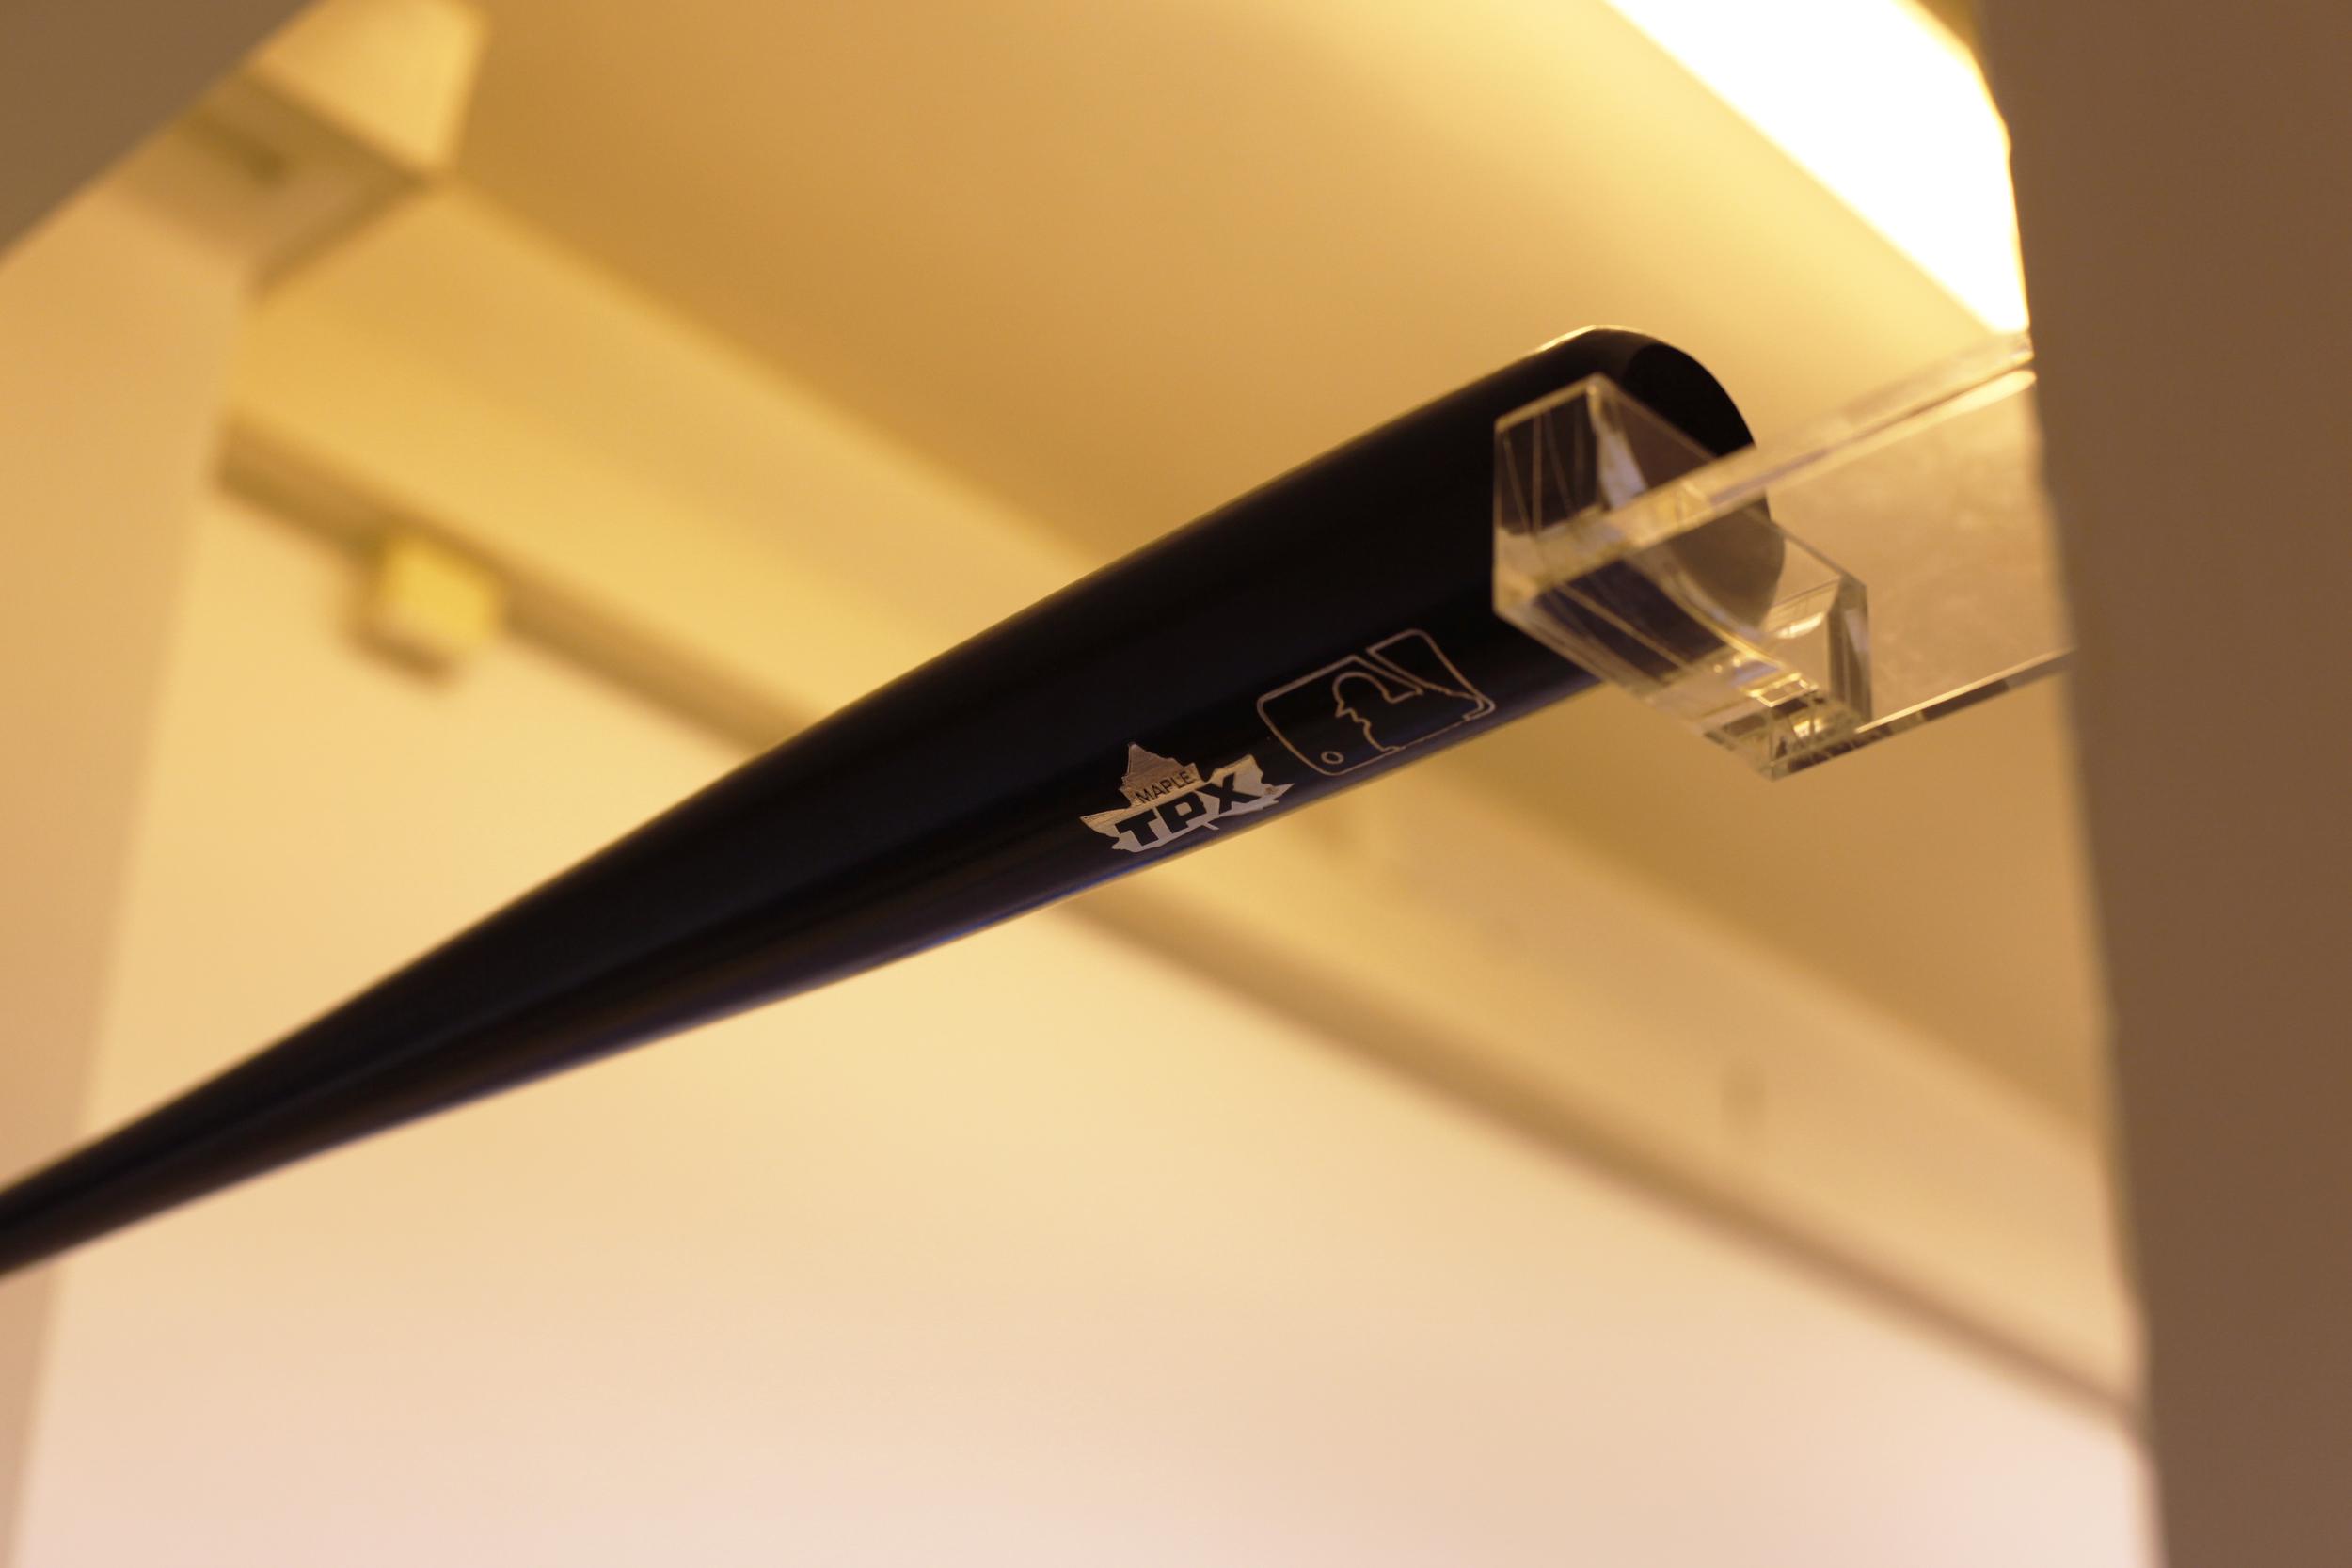 Liber-May_3-standard-baseball-bats_detail_black_MG_5206.jpg